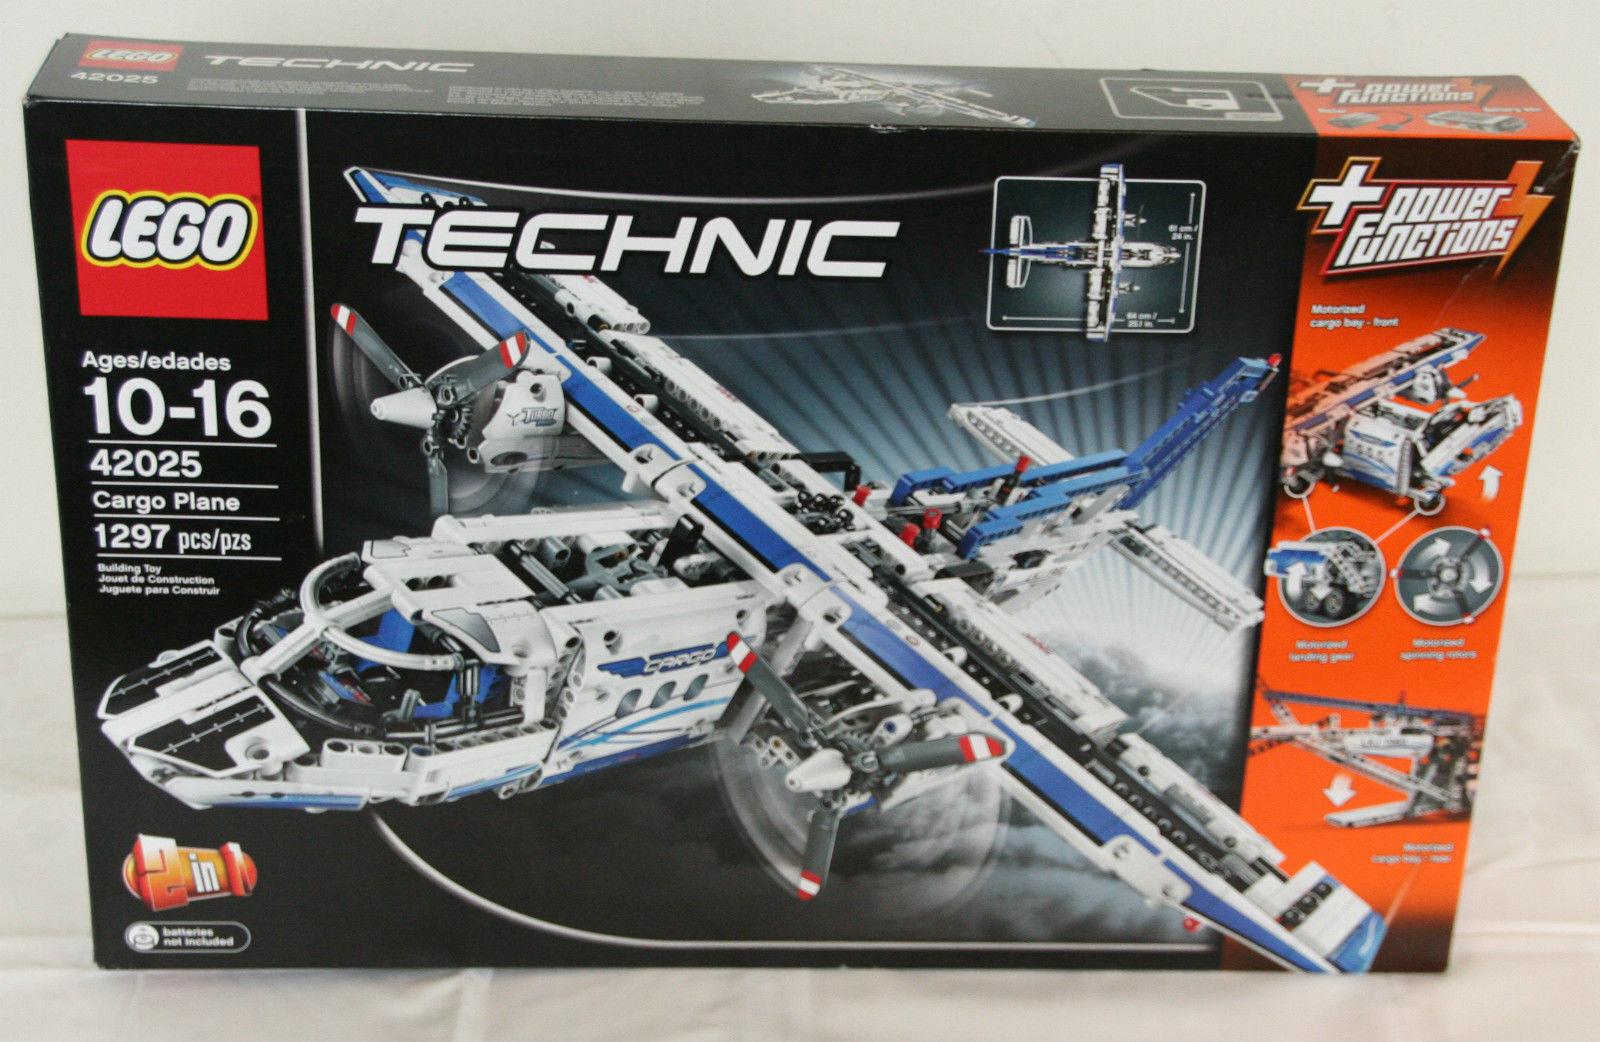 LEGO Technic 42025 Cargo Plane 1295 Pieces Nuovo Sealed